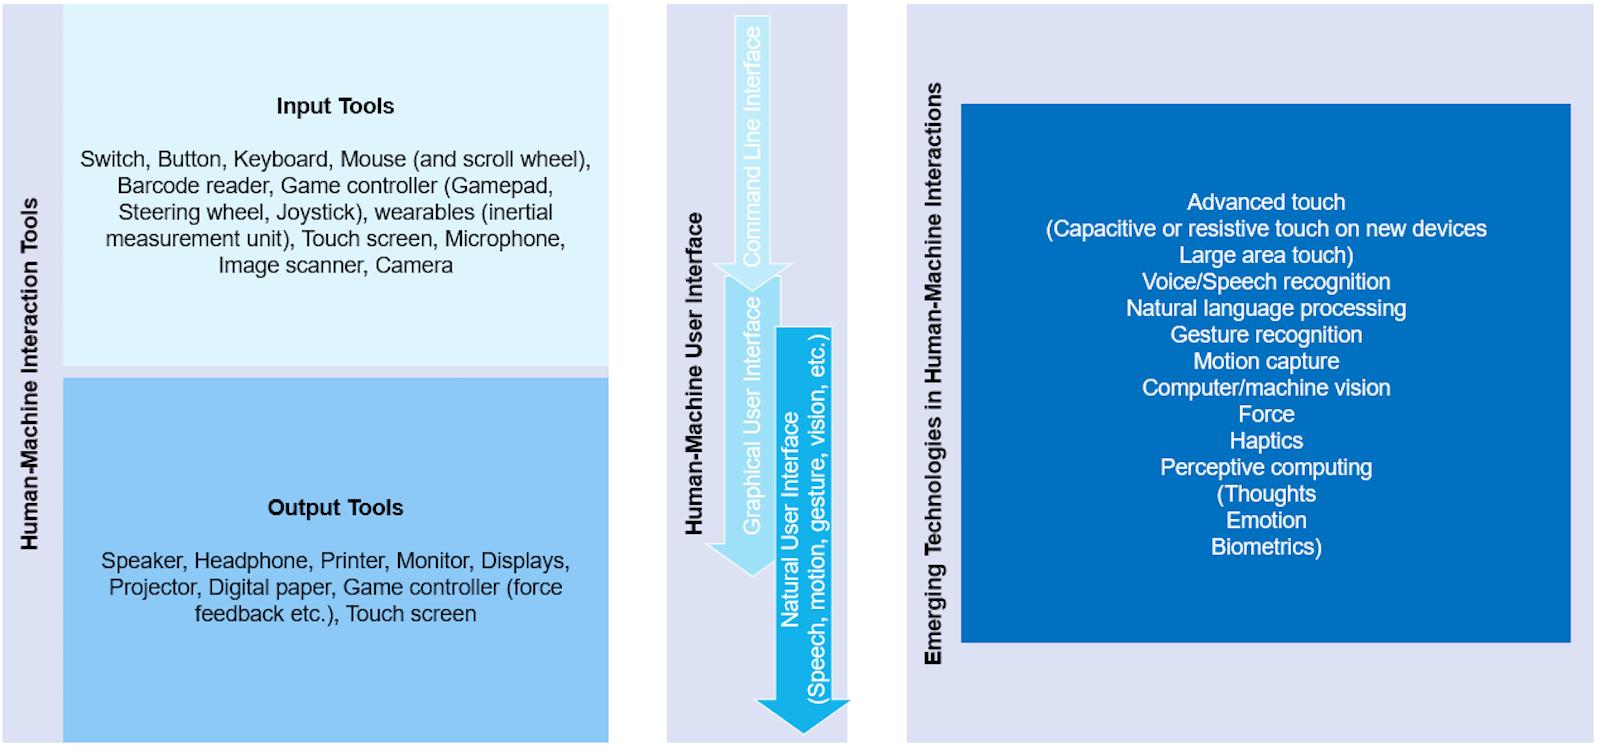 Voice, Speech, Conversation-Based User Interfaces 2019-2029